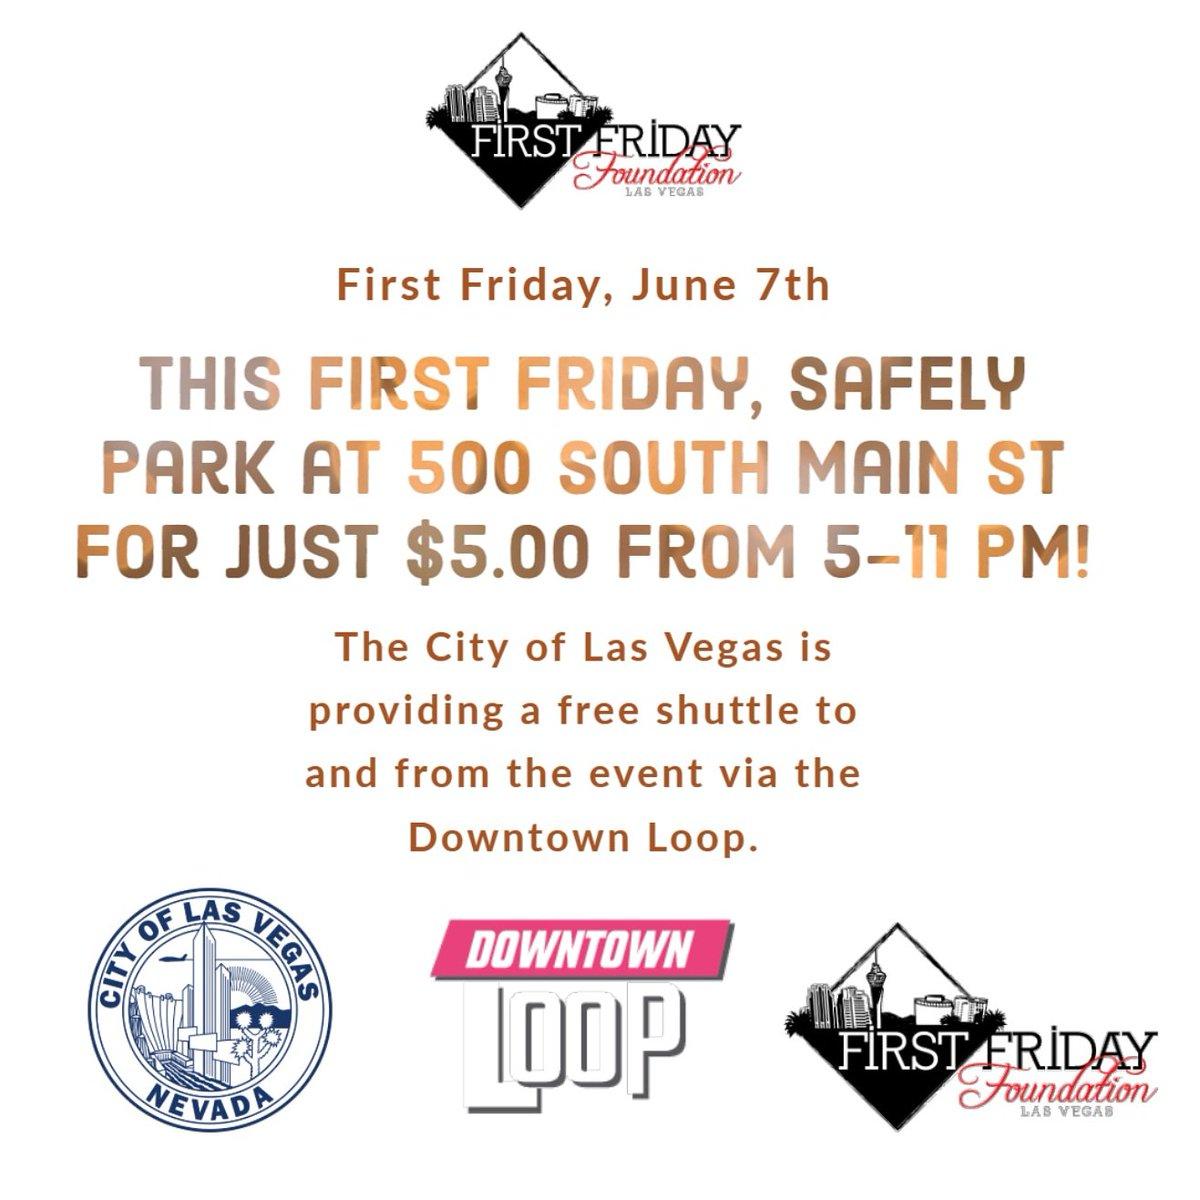 First Friday LV (@FirstFridayLV) | Twitter